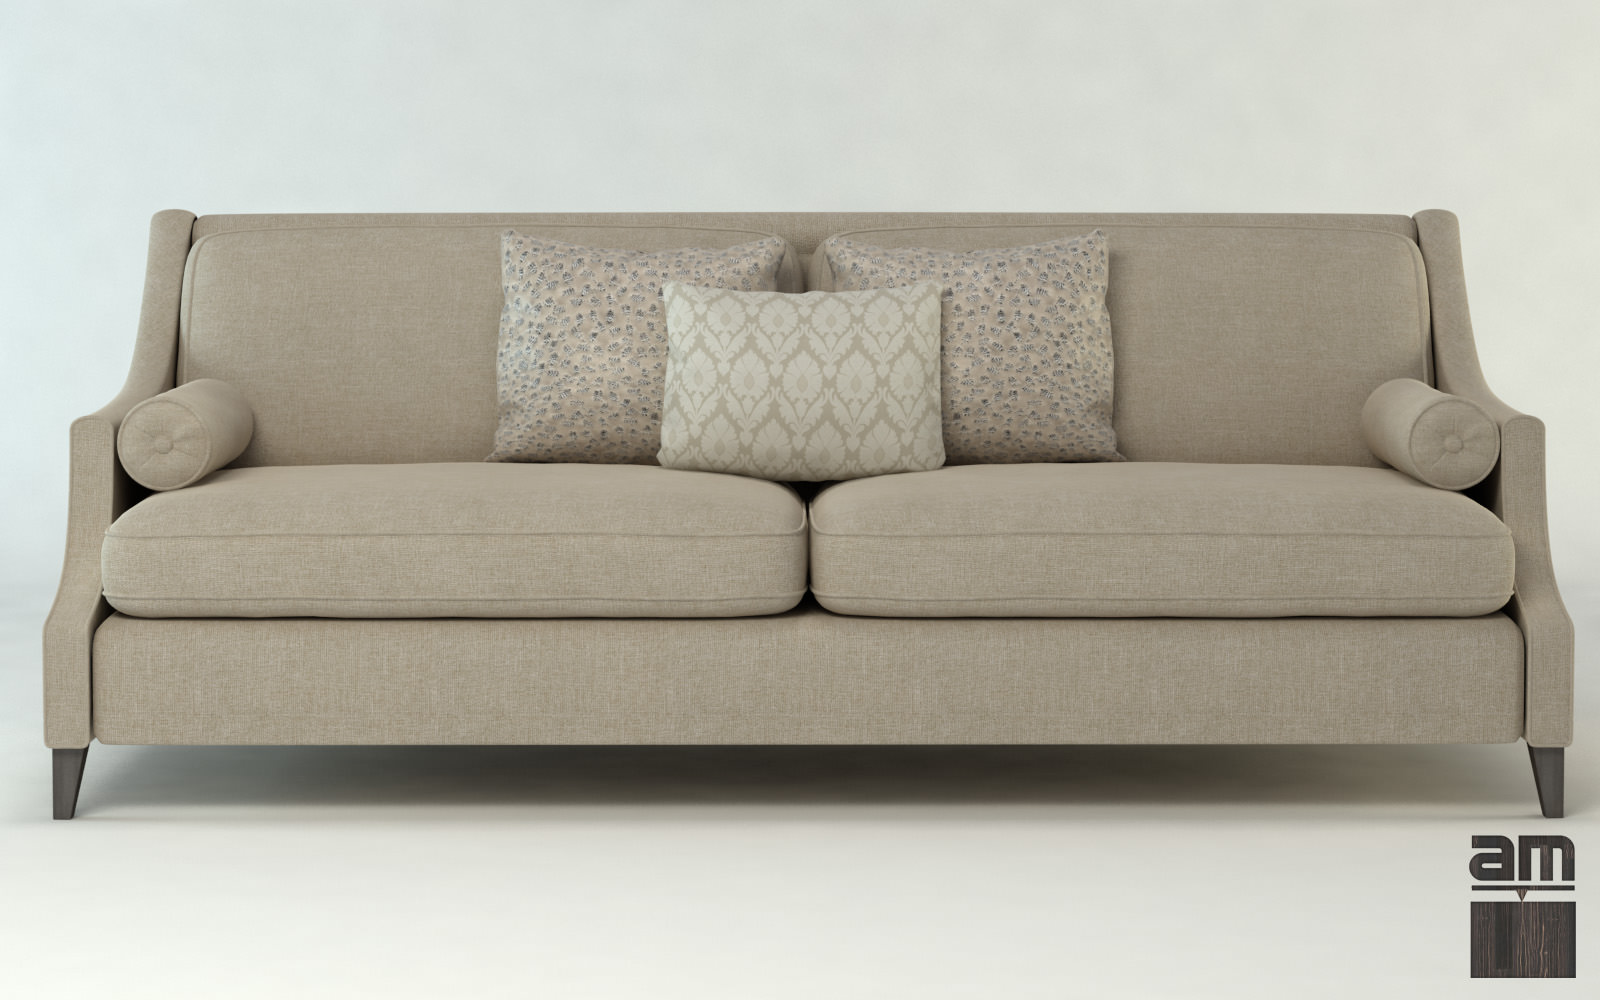 Modern sofa dubai 3d model max obj fbx cgtradercom for Sectional sofas dubai